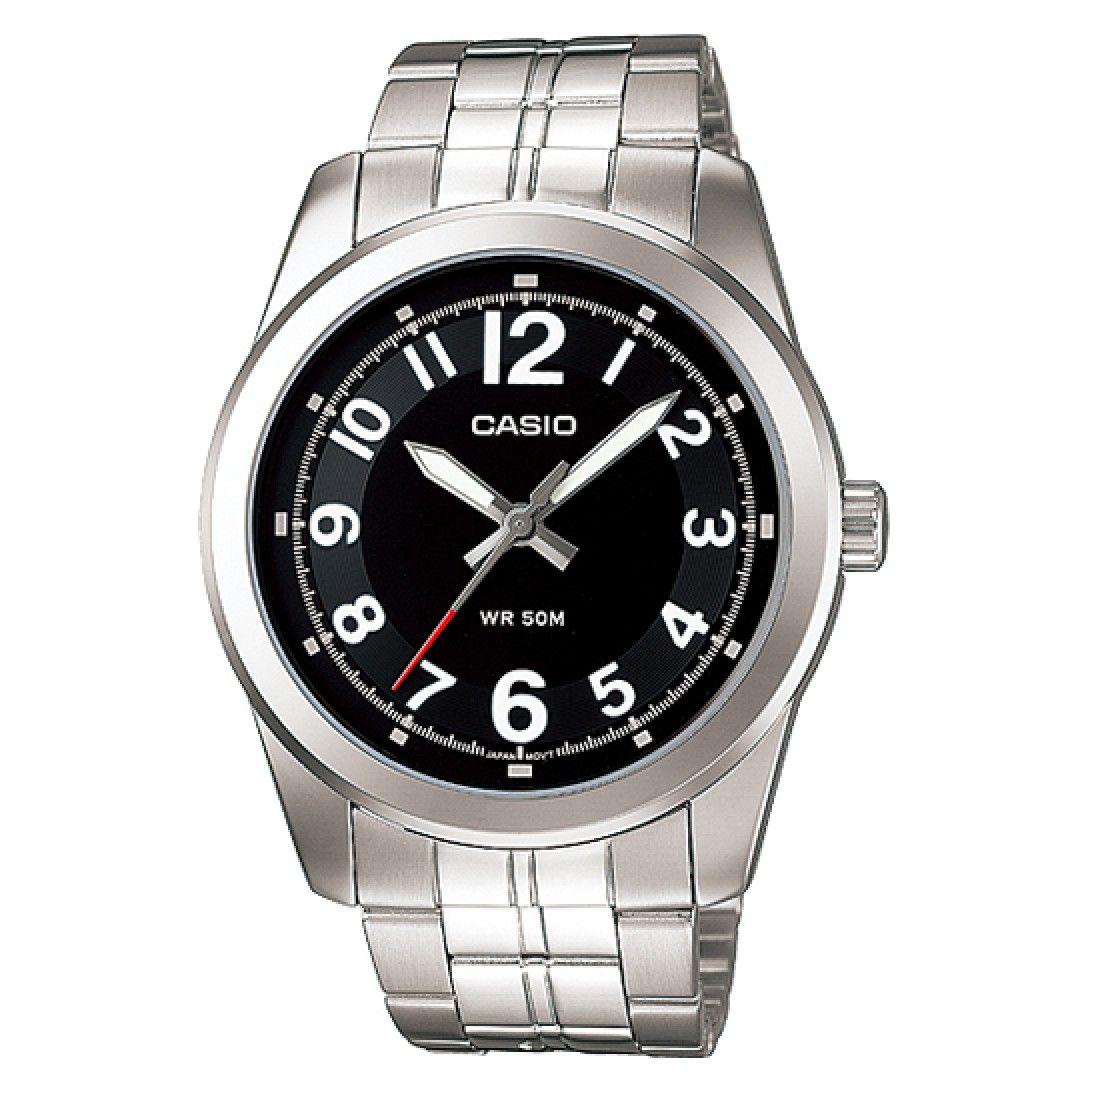 Relógio Masculino Casio MTP-1315D-1BVDF Pulseira Aço Inox  - Alexandre Venturini